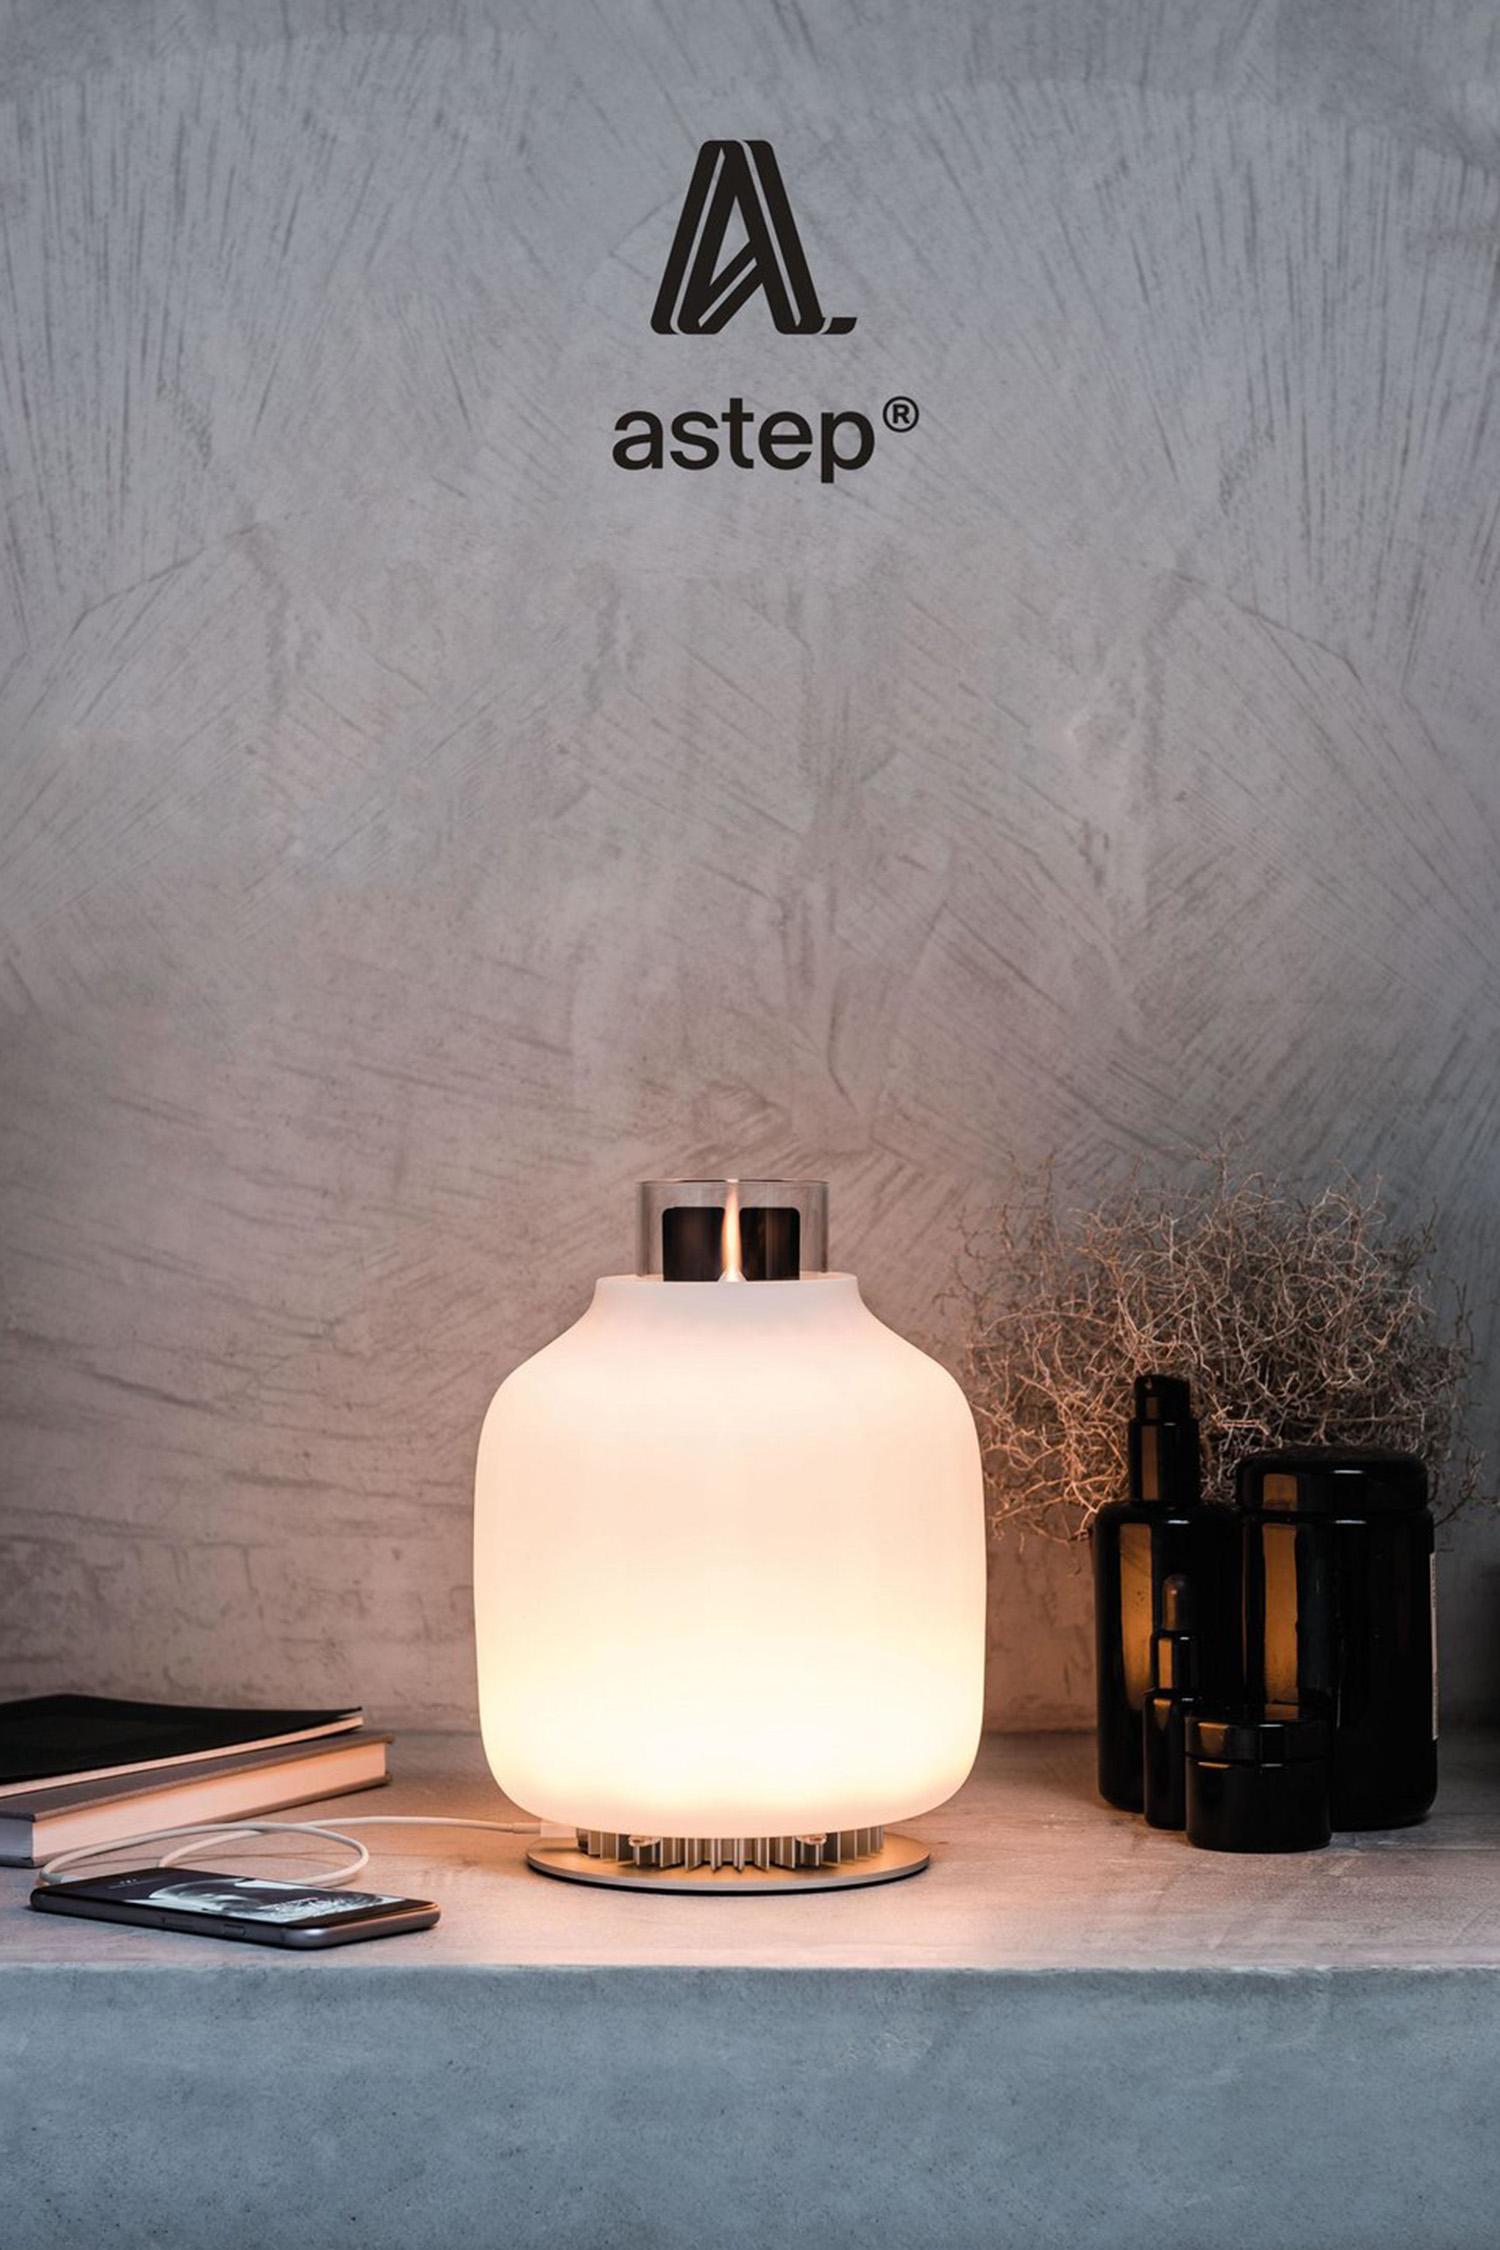 Astep 'Candella' Winner of German Design Award 2018